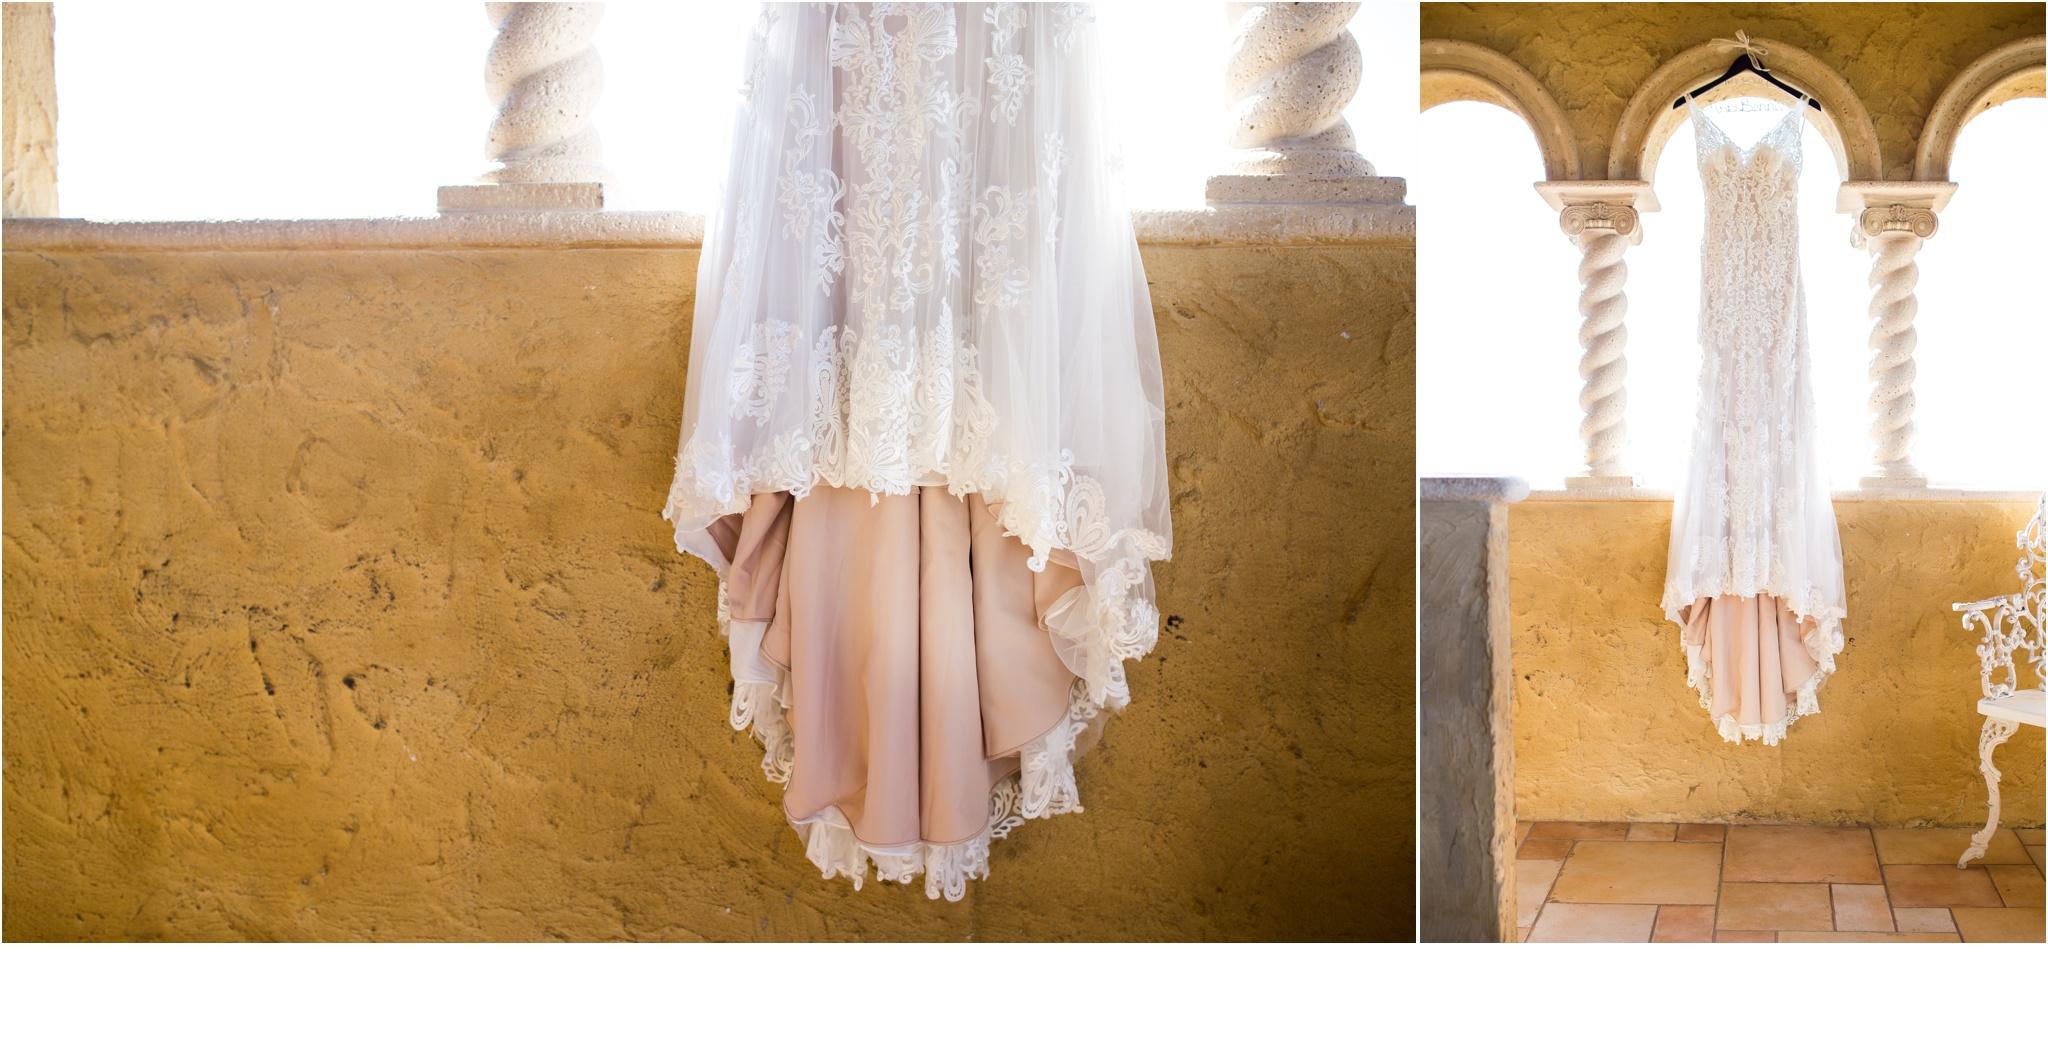 Rainey_Gregg_Photography_St._Simons_Island_Georgia_California_Wedding_Portrait_Photography_0626.jpg